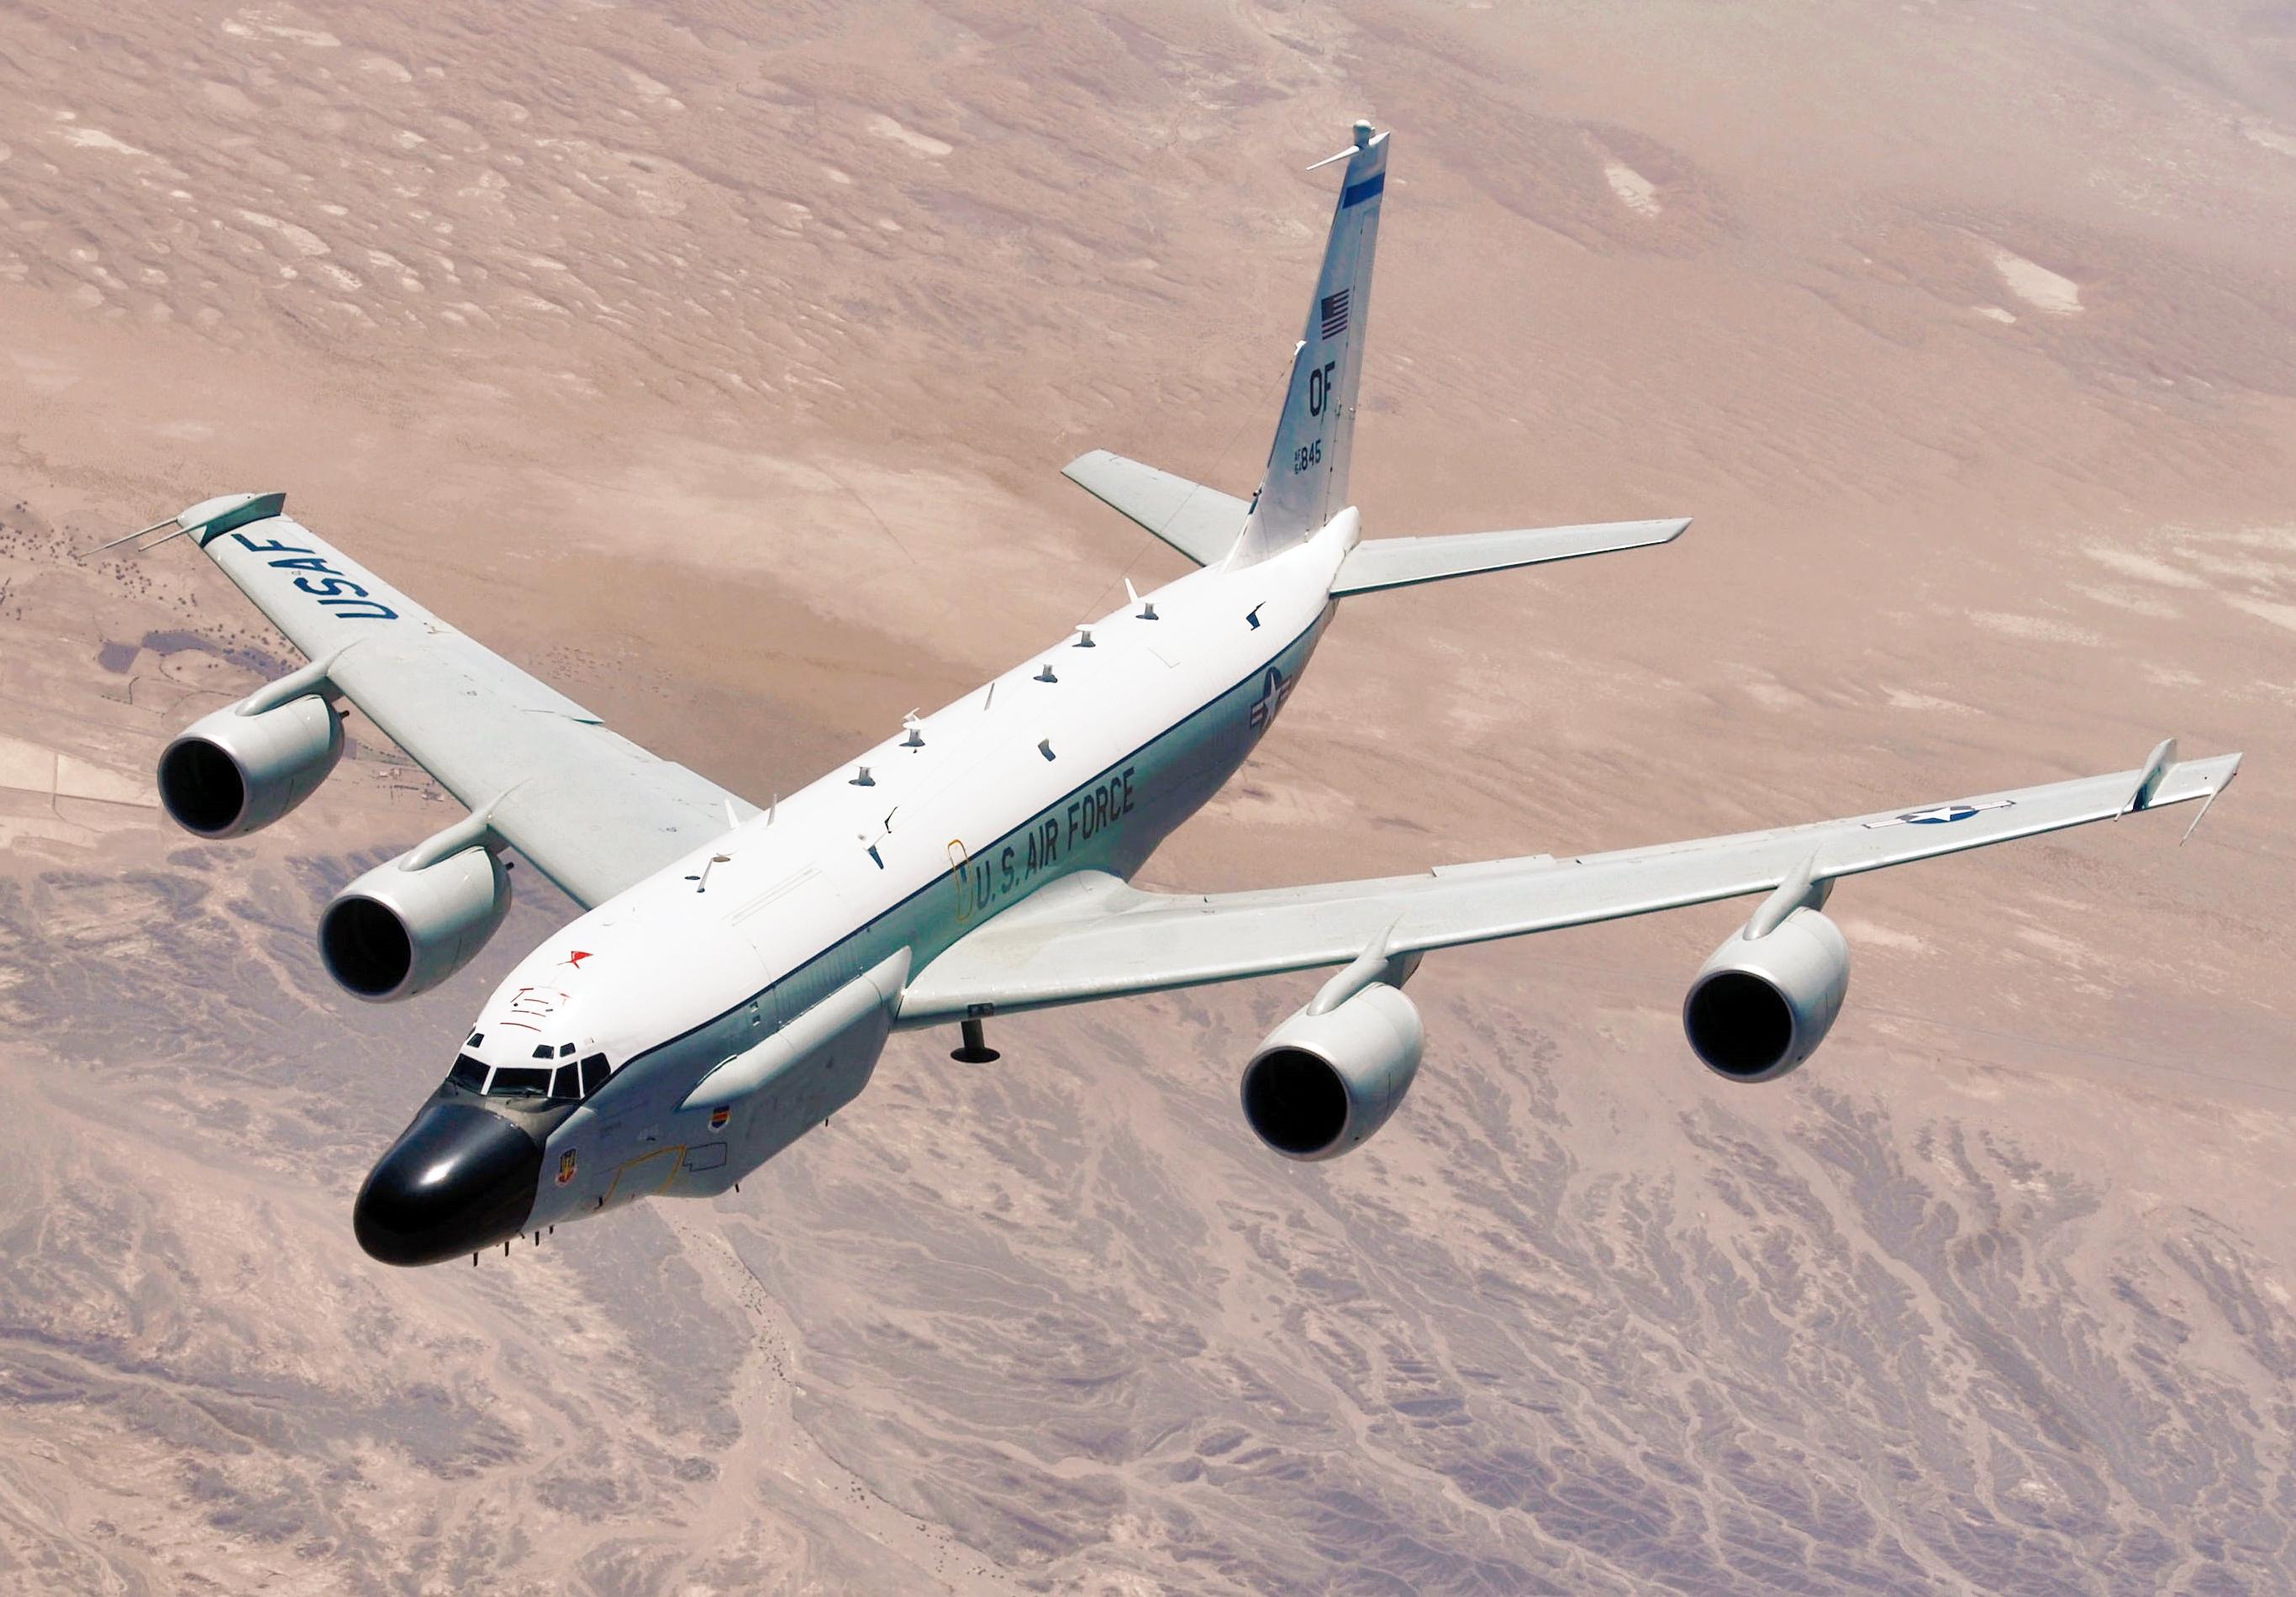 https://upload.wikimedia.org/wikipedia/commons/4/49/RC-135_Rivet_Joint_in_flight.jpg